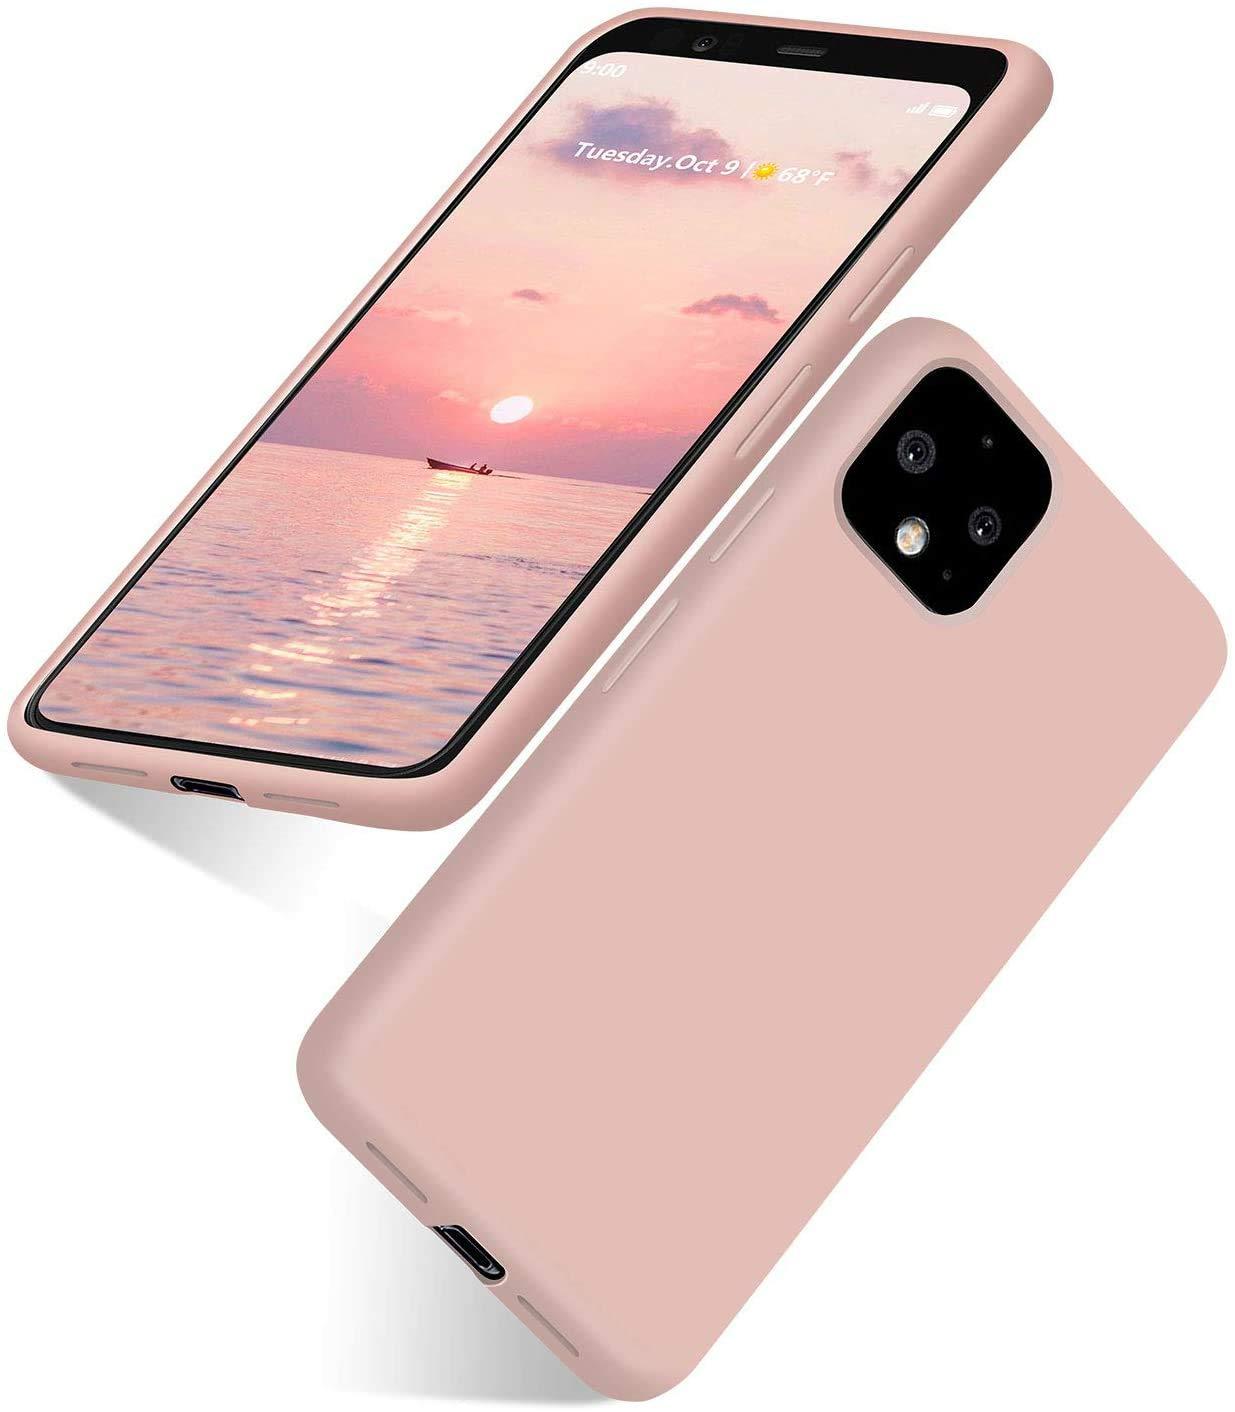 abitku Google Pixel 4 Case, Google Pixel 4 Silicone Slim Gel Rubber Phone Case Soft Microfiber Cloth Lining Cushion Compatible for Google Pixel 4 5.5 inch (2019) (Pink Sand)